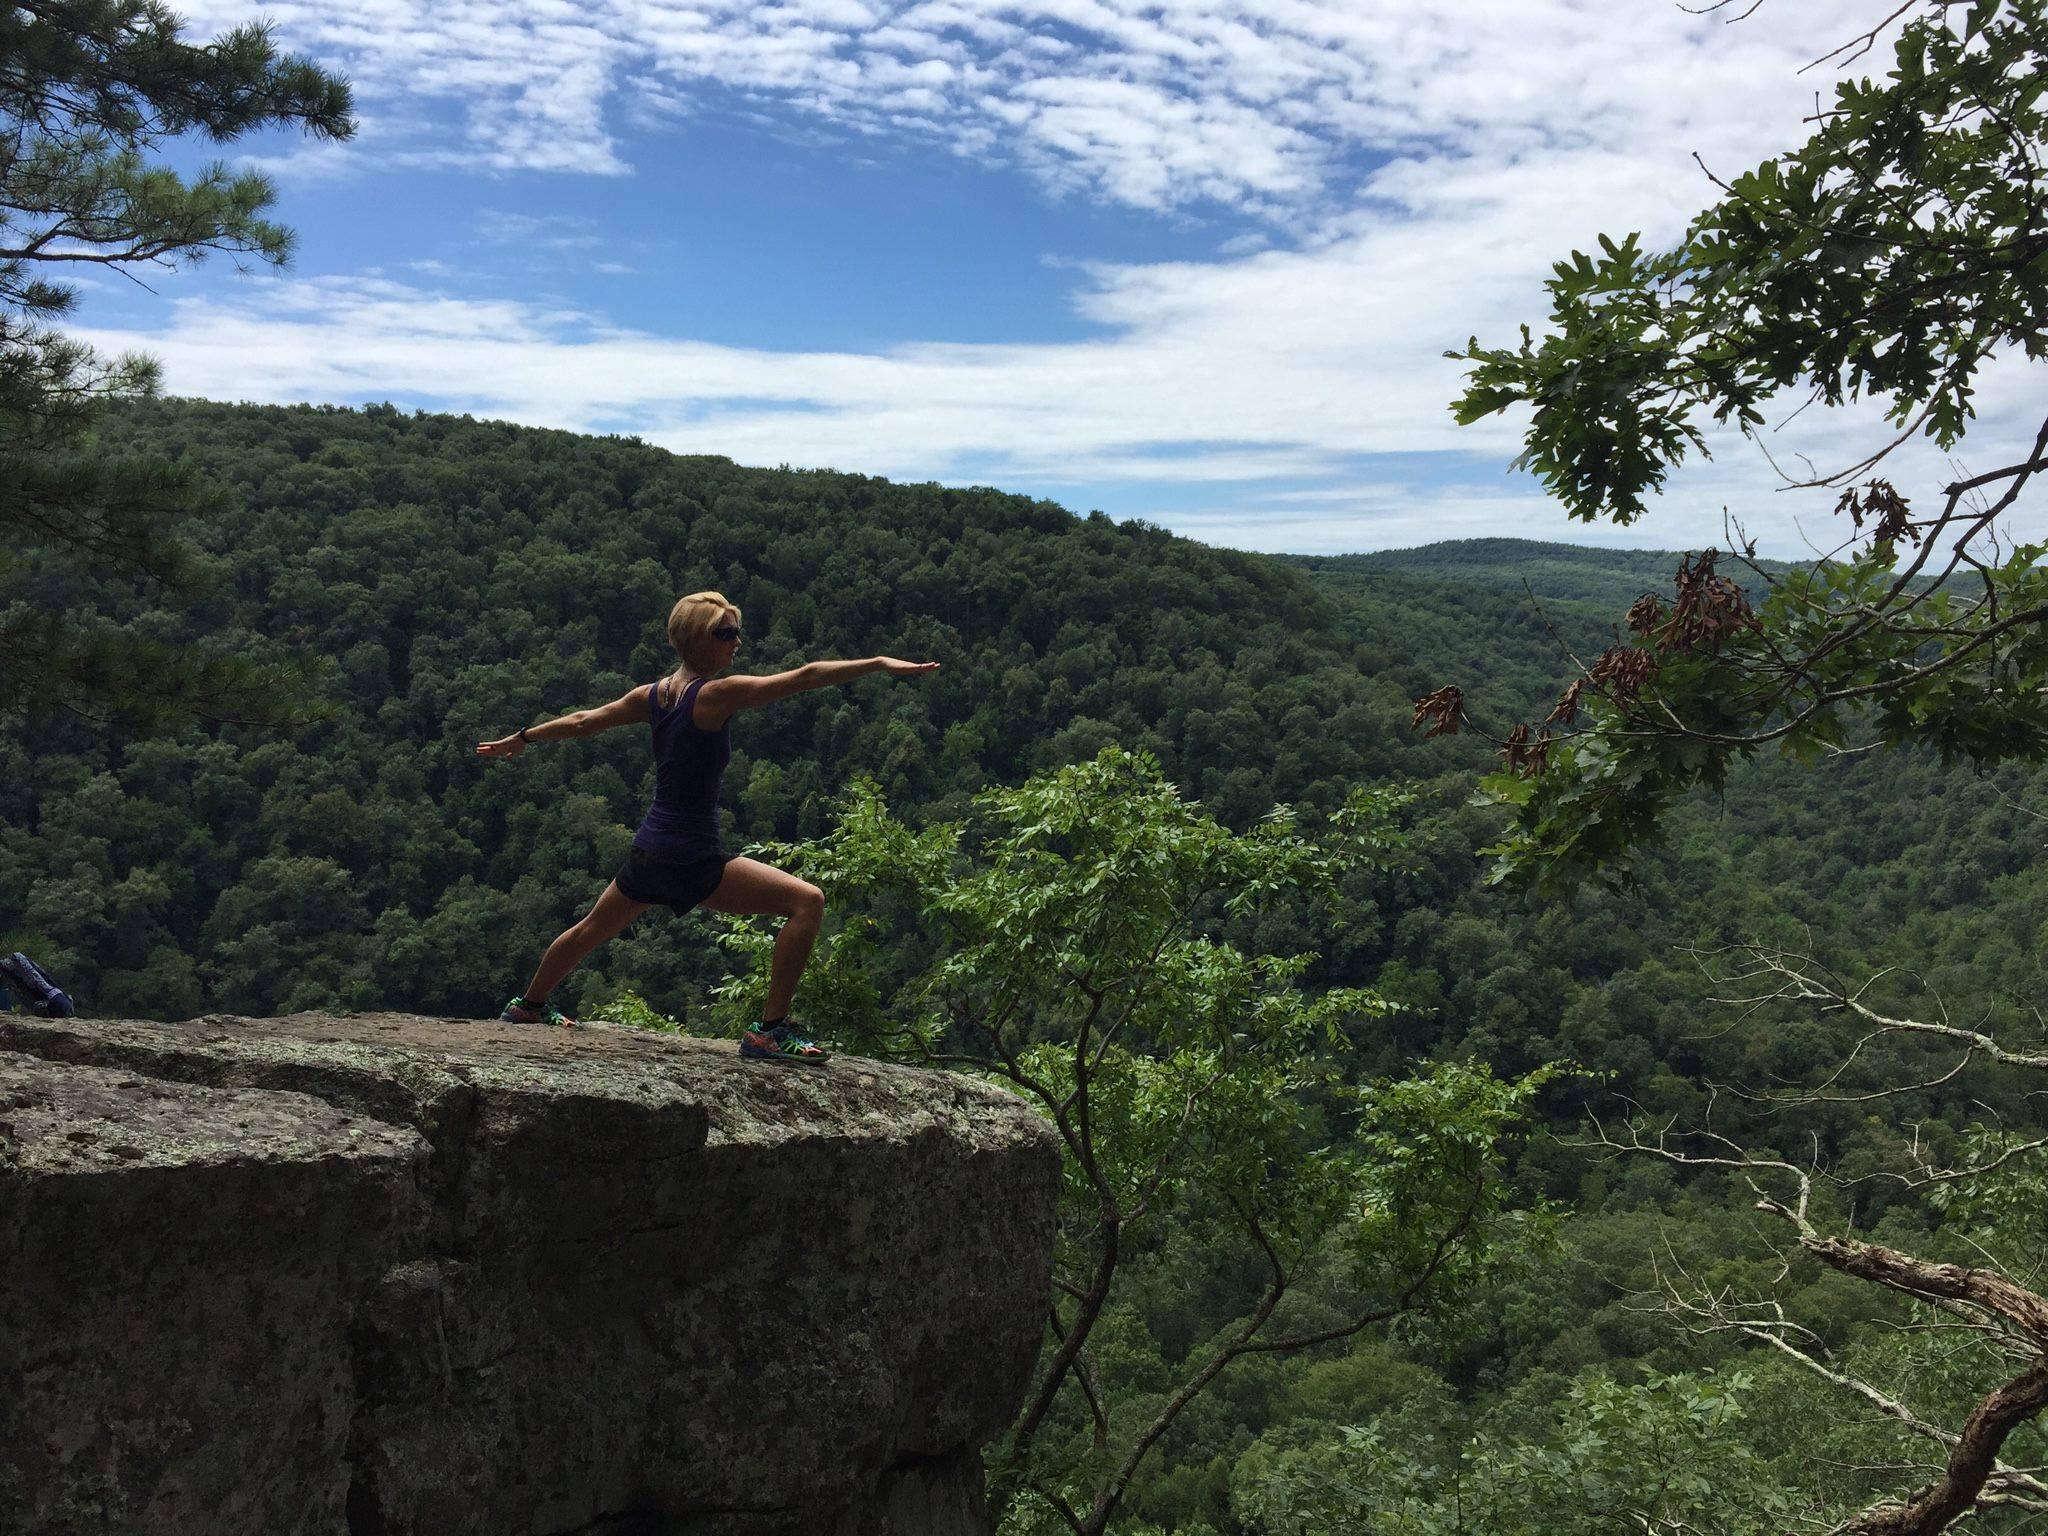 Kira Shares Inspiring Recovery Story